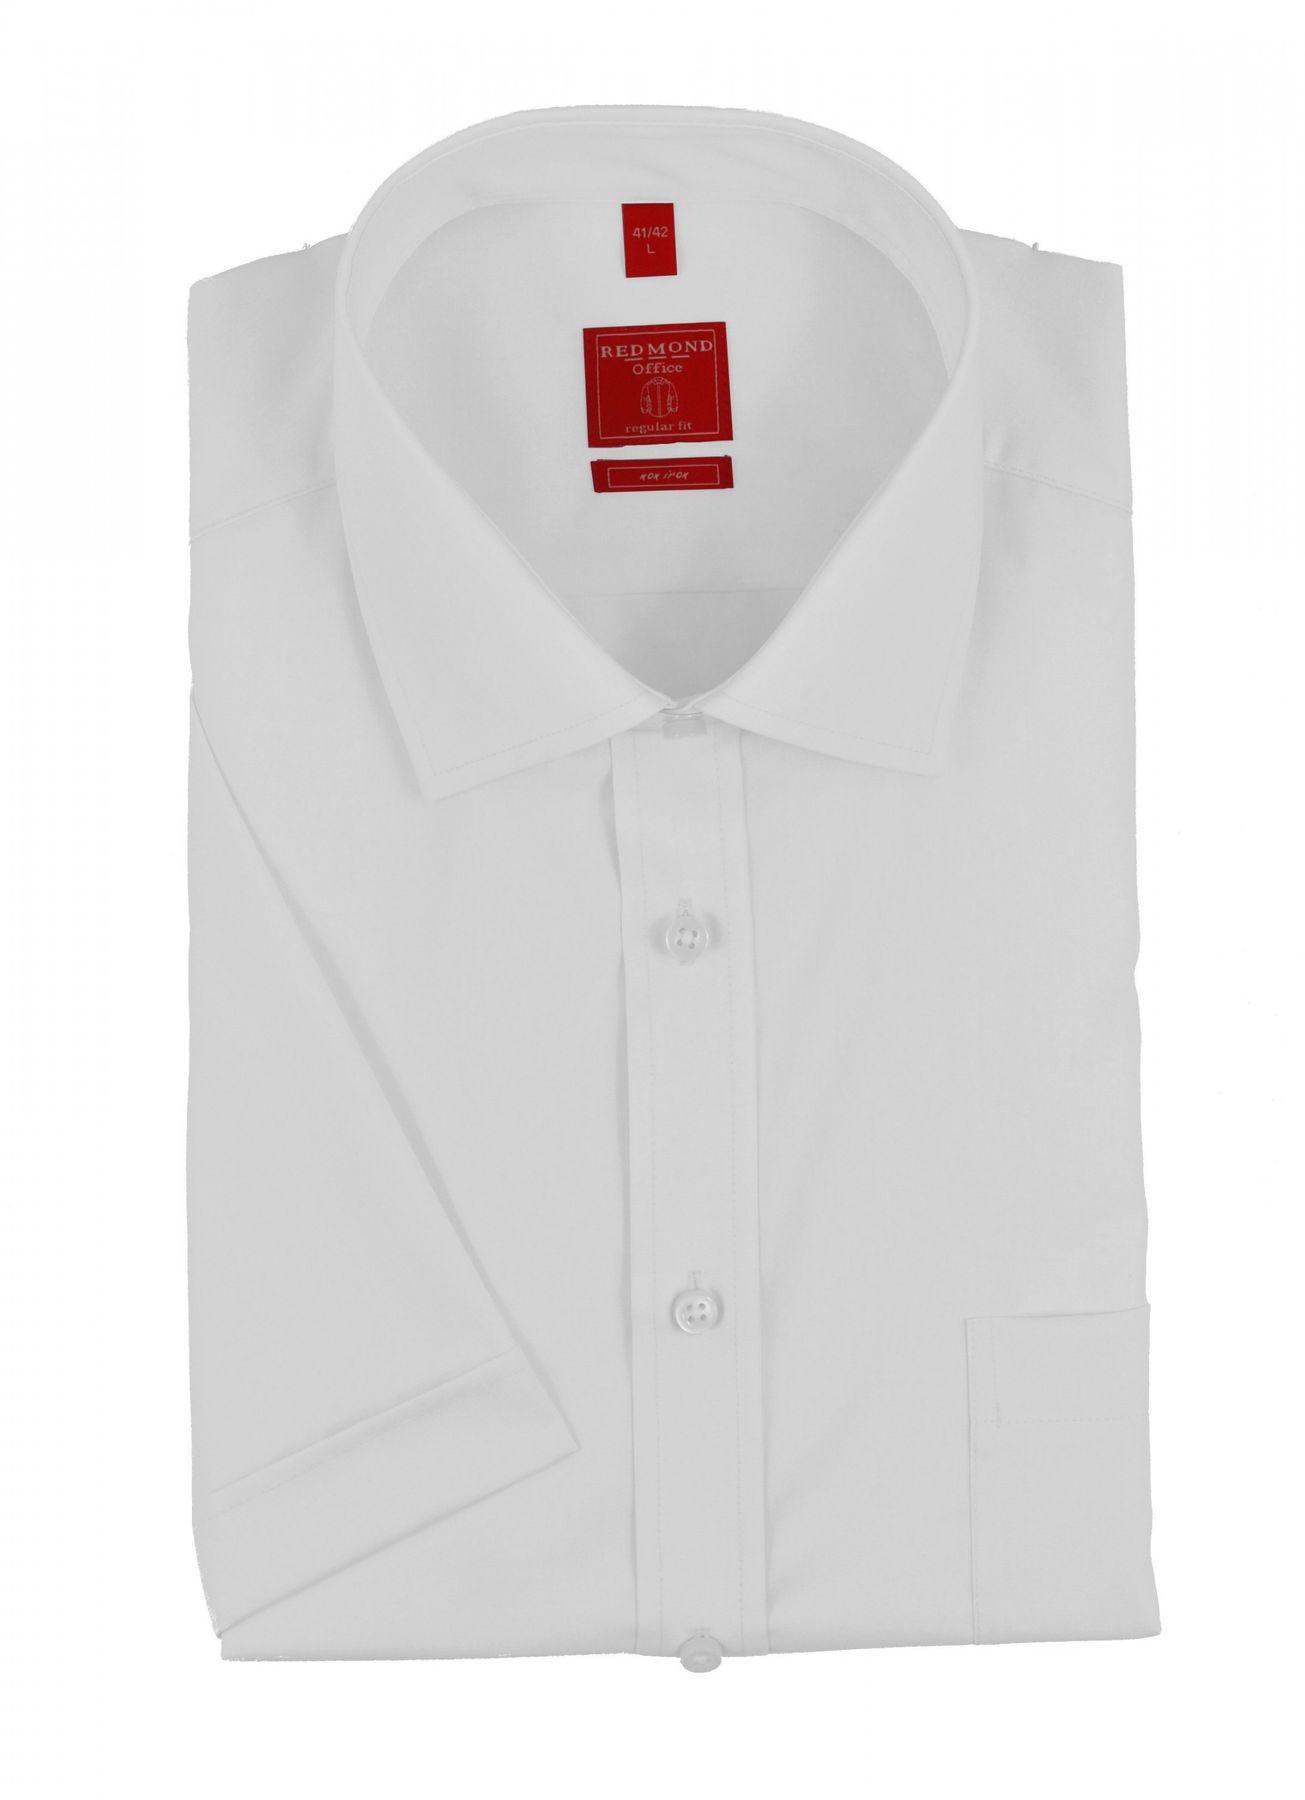 Redmond - Regular Fit - Herren Kurzarm Hemd mit Kent-Kragen in verschiedenen Farben (150920 A) – Bild 3